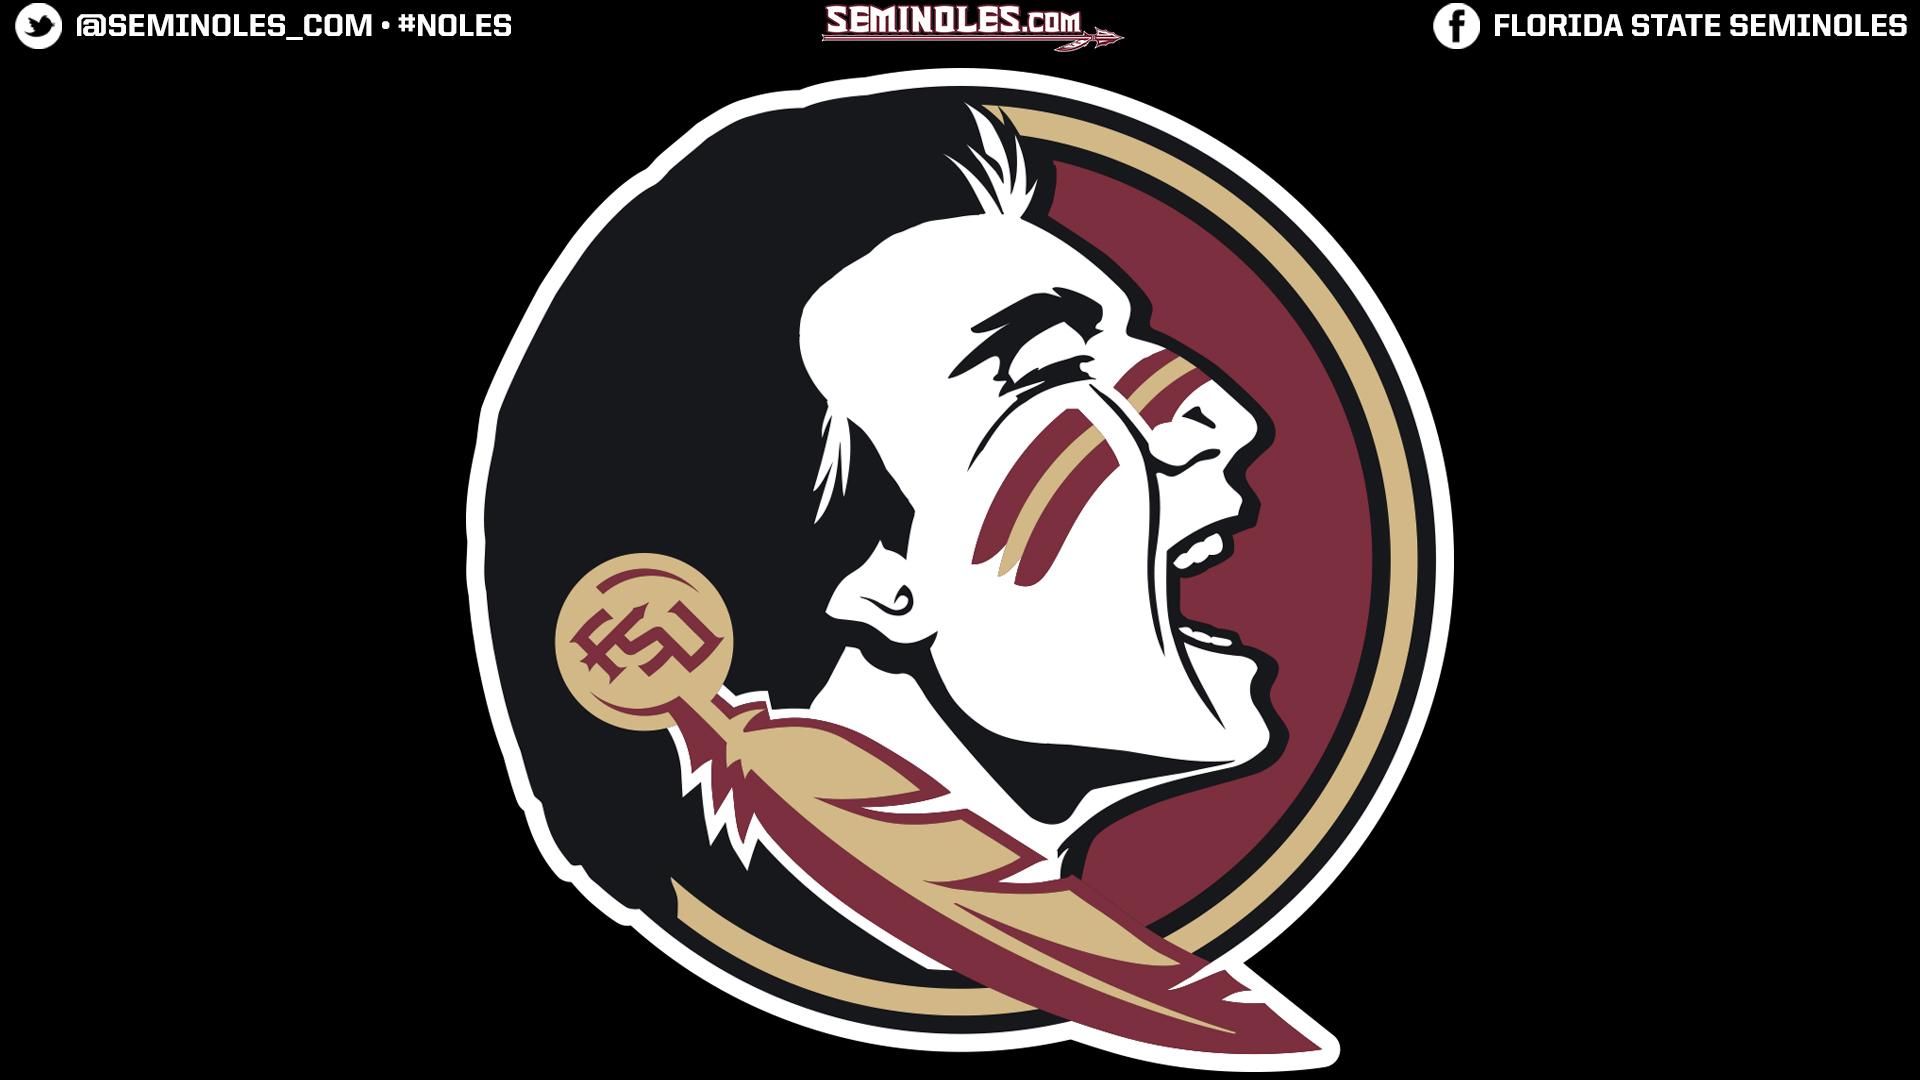 Florida State Seminoles Official Athletic Site Desktop Wallpaper